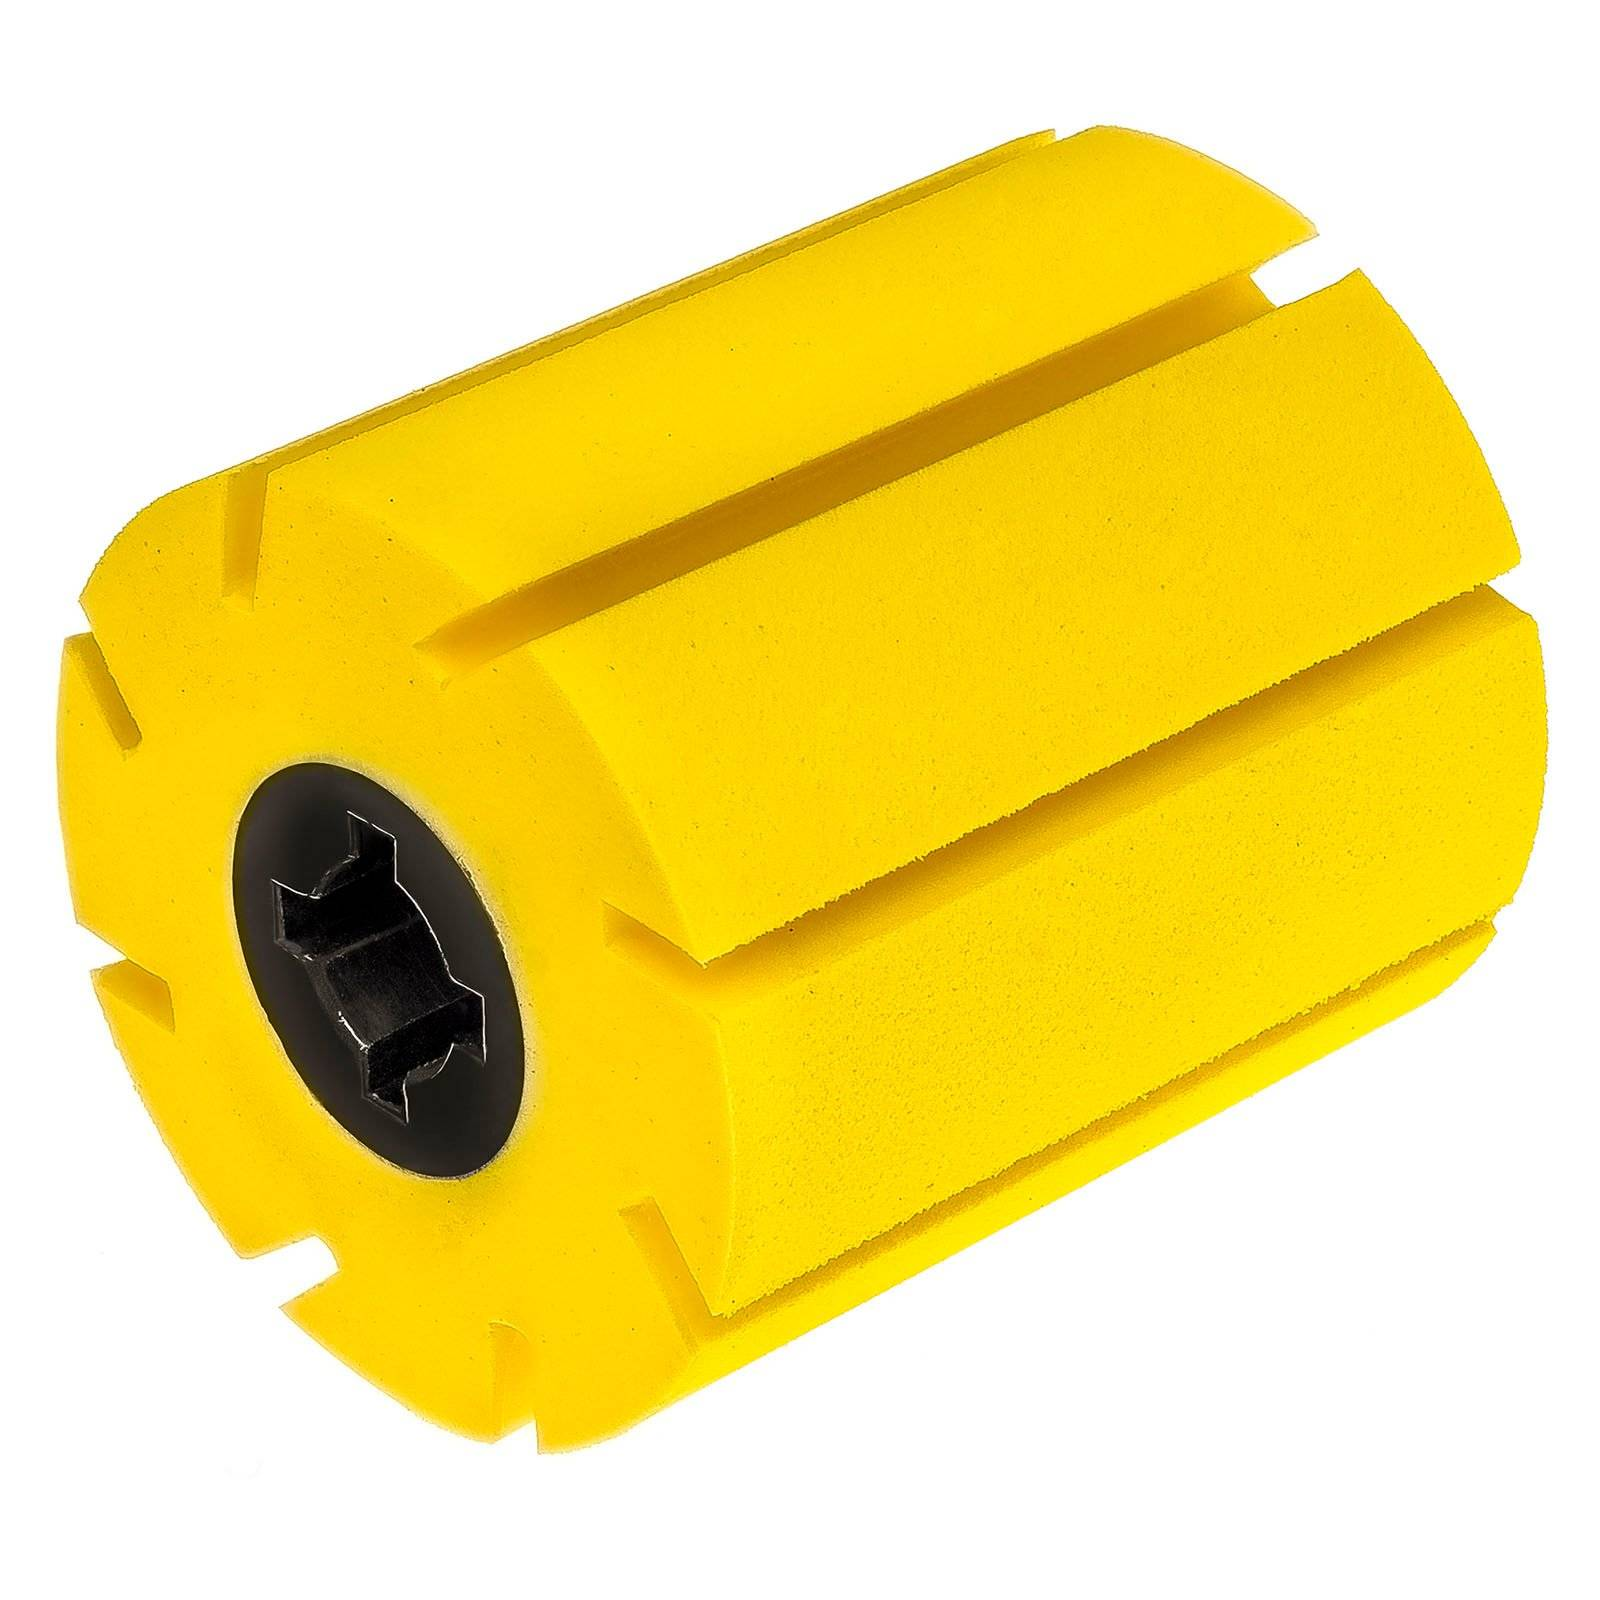 msw rullo a espansione - giallo -roller-900y